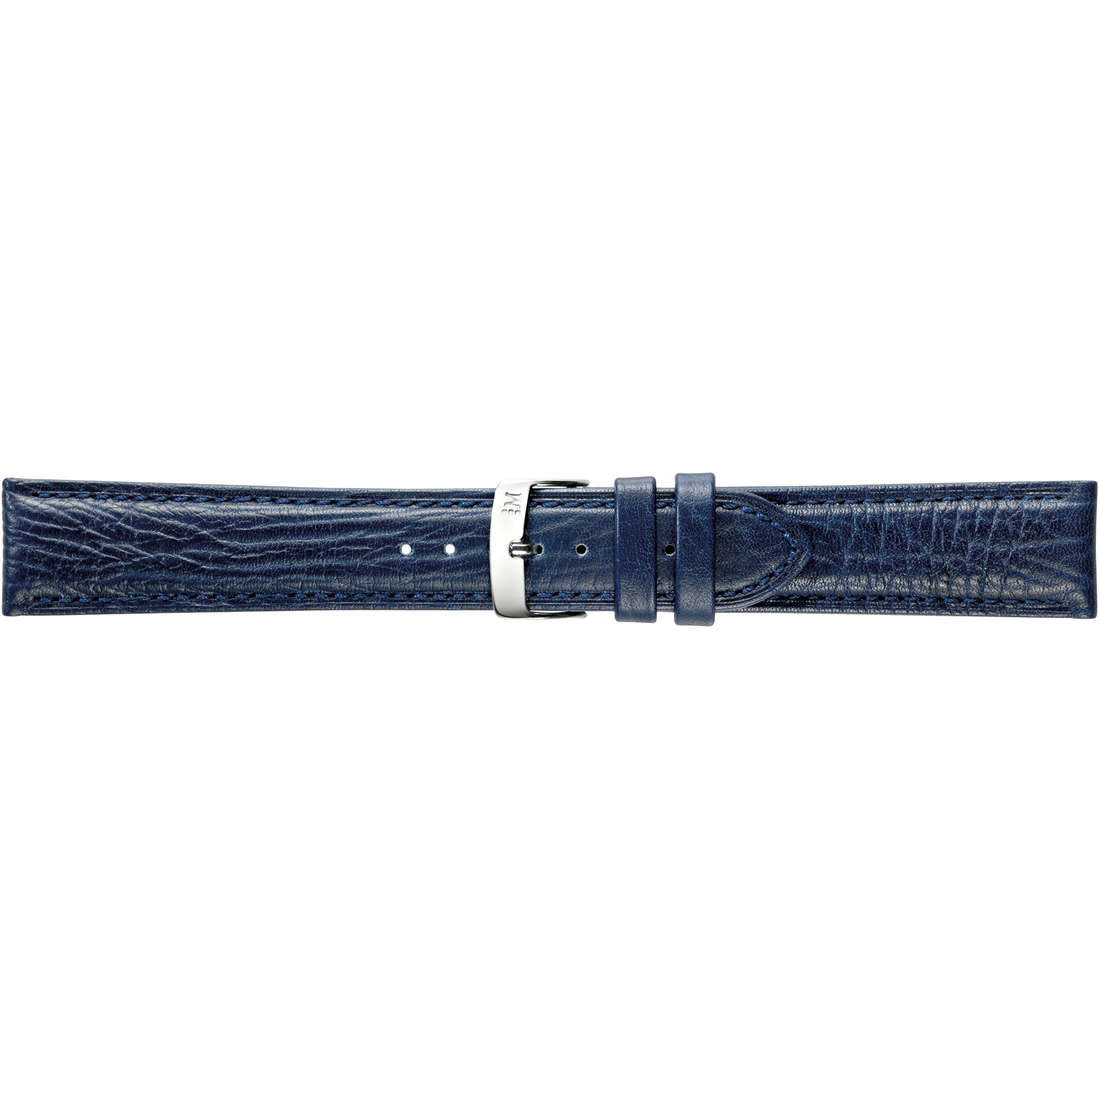 watch watch bands watch straps man Morellato Linea Sport A01X4335713062CR24